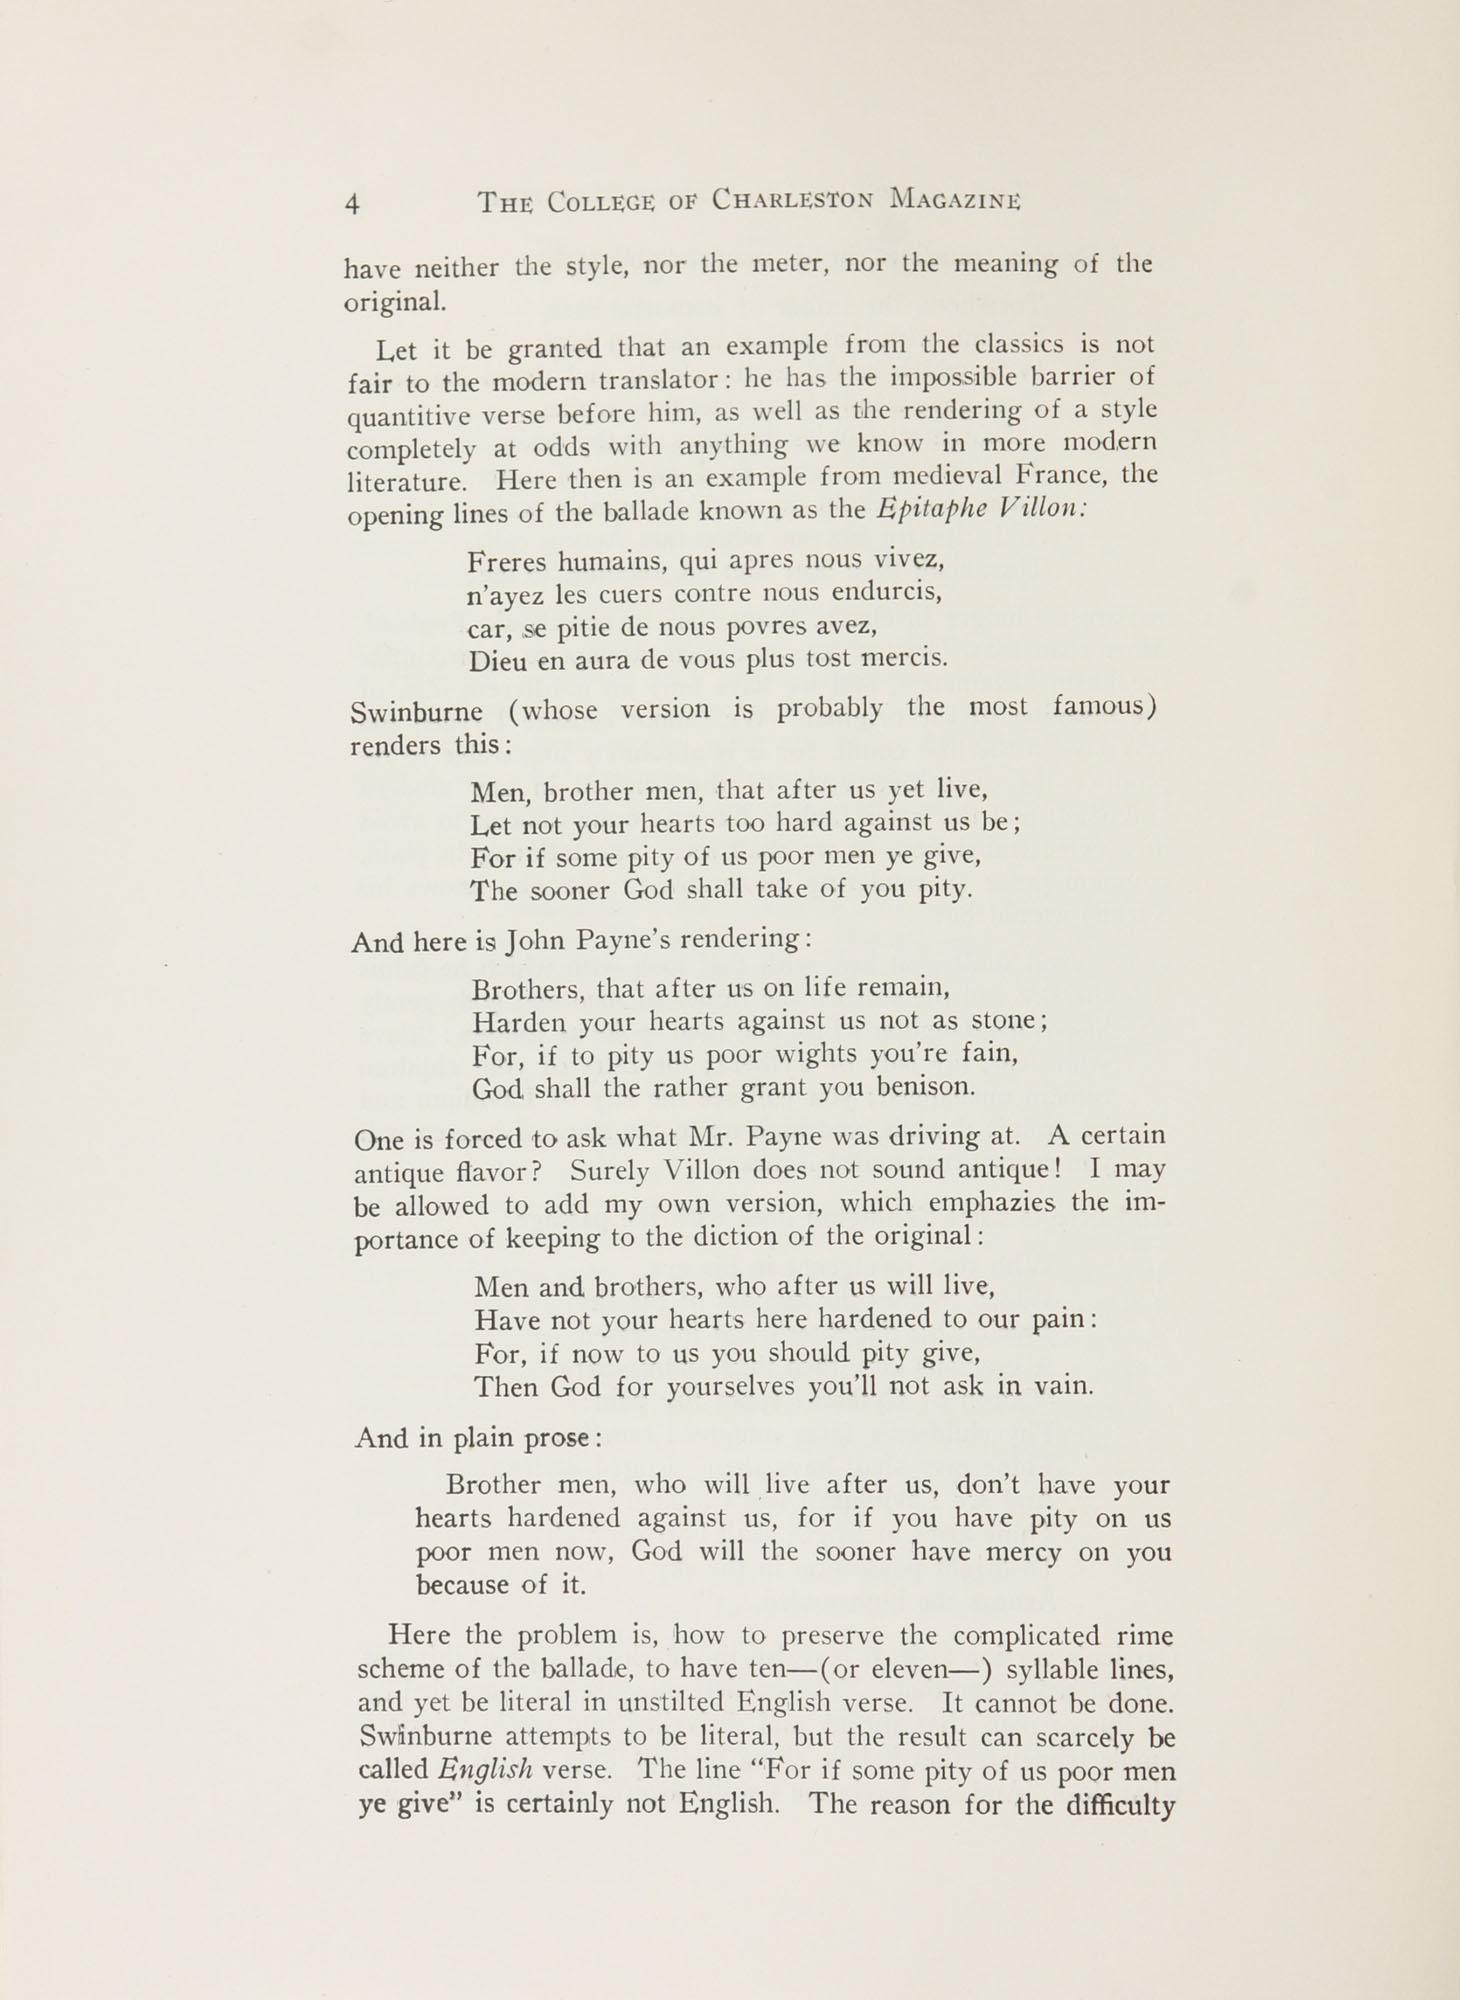 College of Charleston Magazine, 1941-1942, Vol. 45 No. 1, page 4